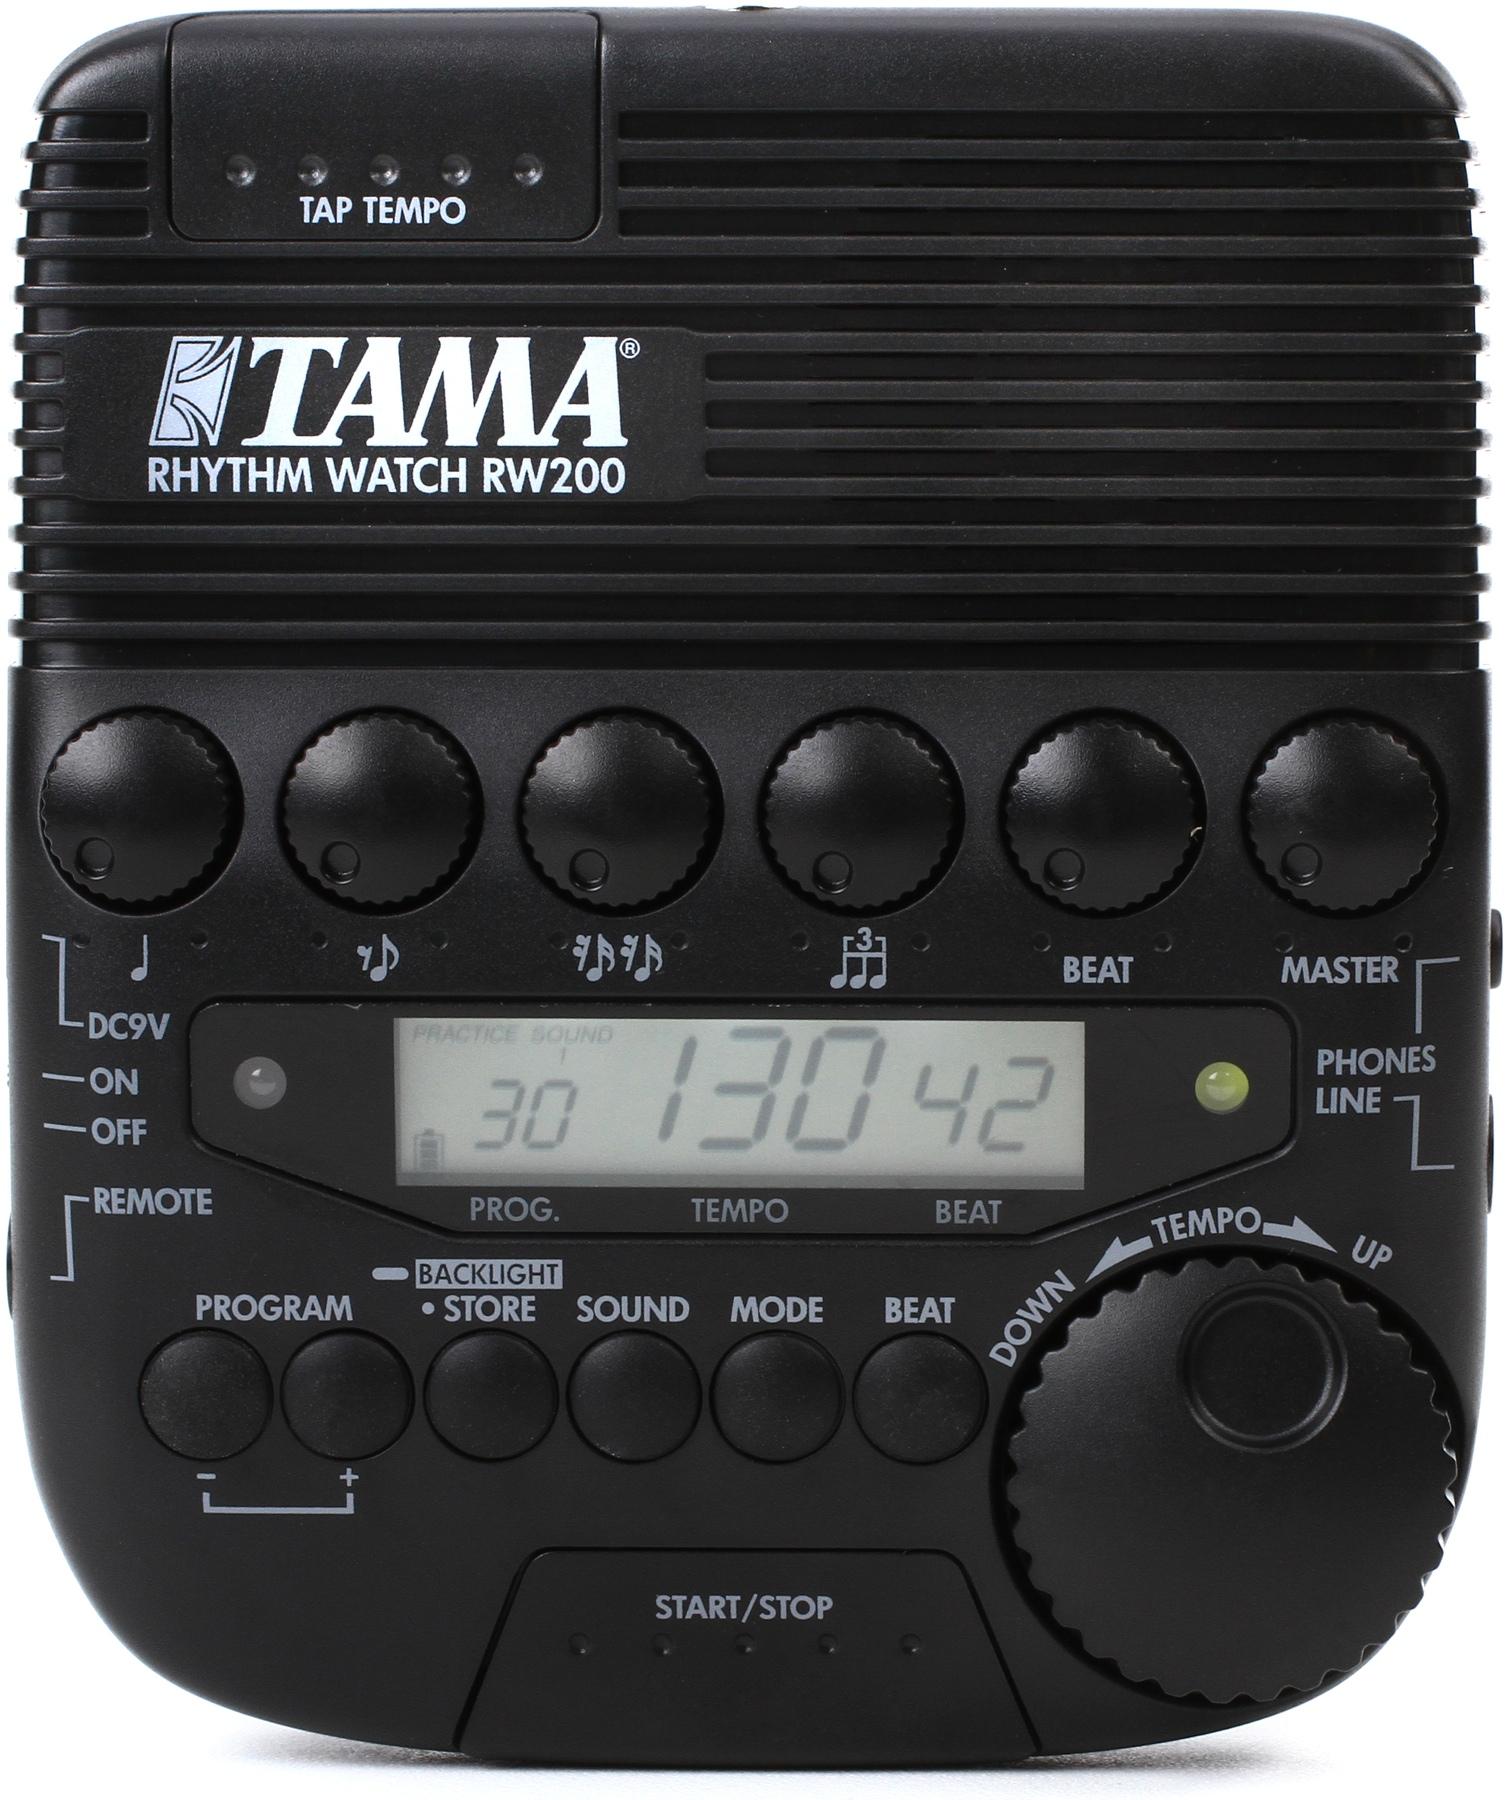 5. Tama RW200 Rhythm Watch - Drummer's Metronome